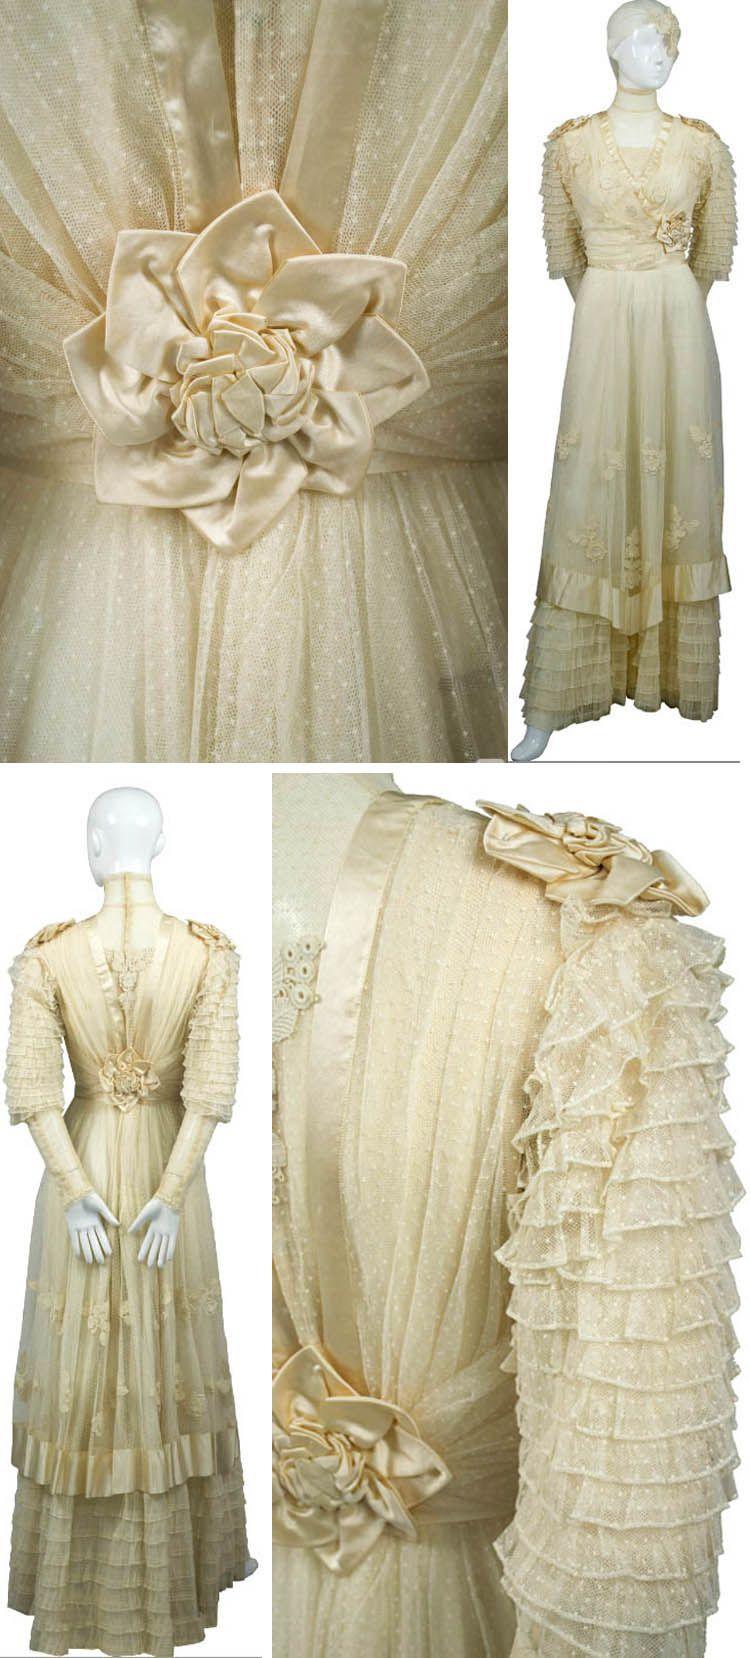 Edwardian wedding dress  Edwardianera wedding dress Creamcolored dotted fine netting with